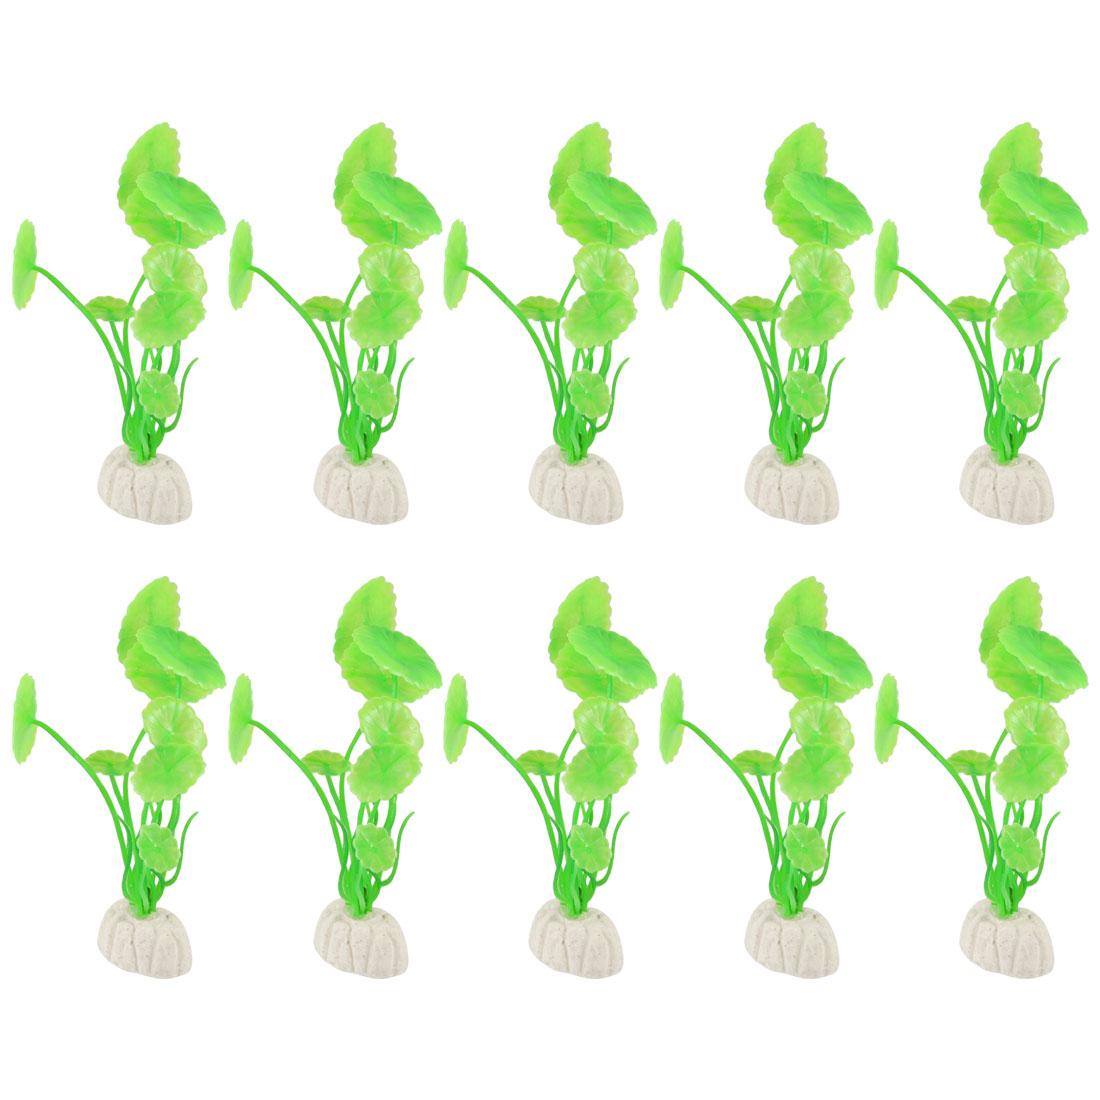 "10 Pcs 4.3"" Height Plastic Green Lotus Leaves Shaped Water Plants for Fish Tank Aquarium"